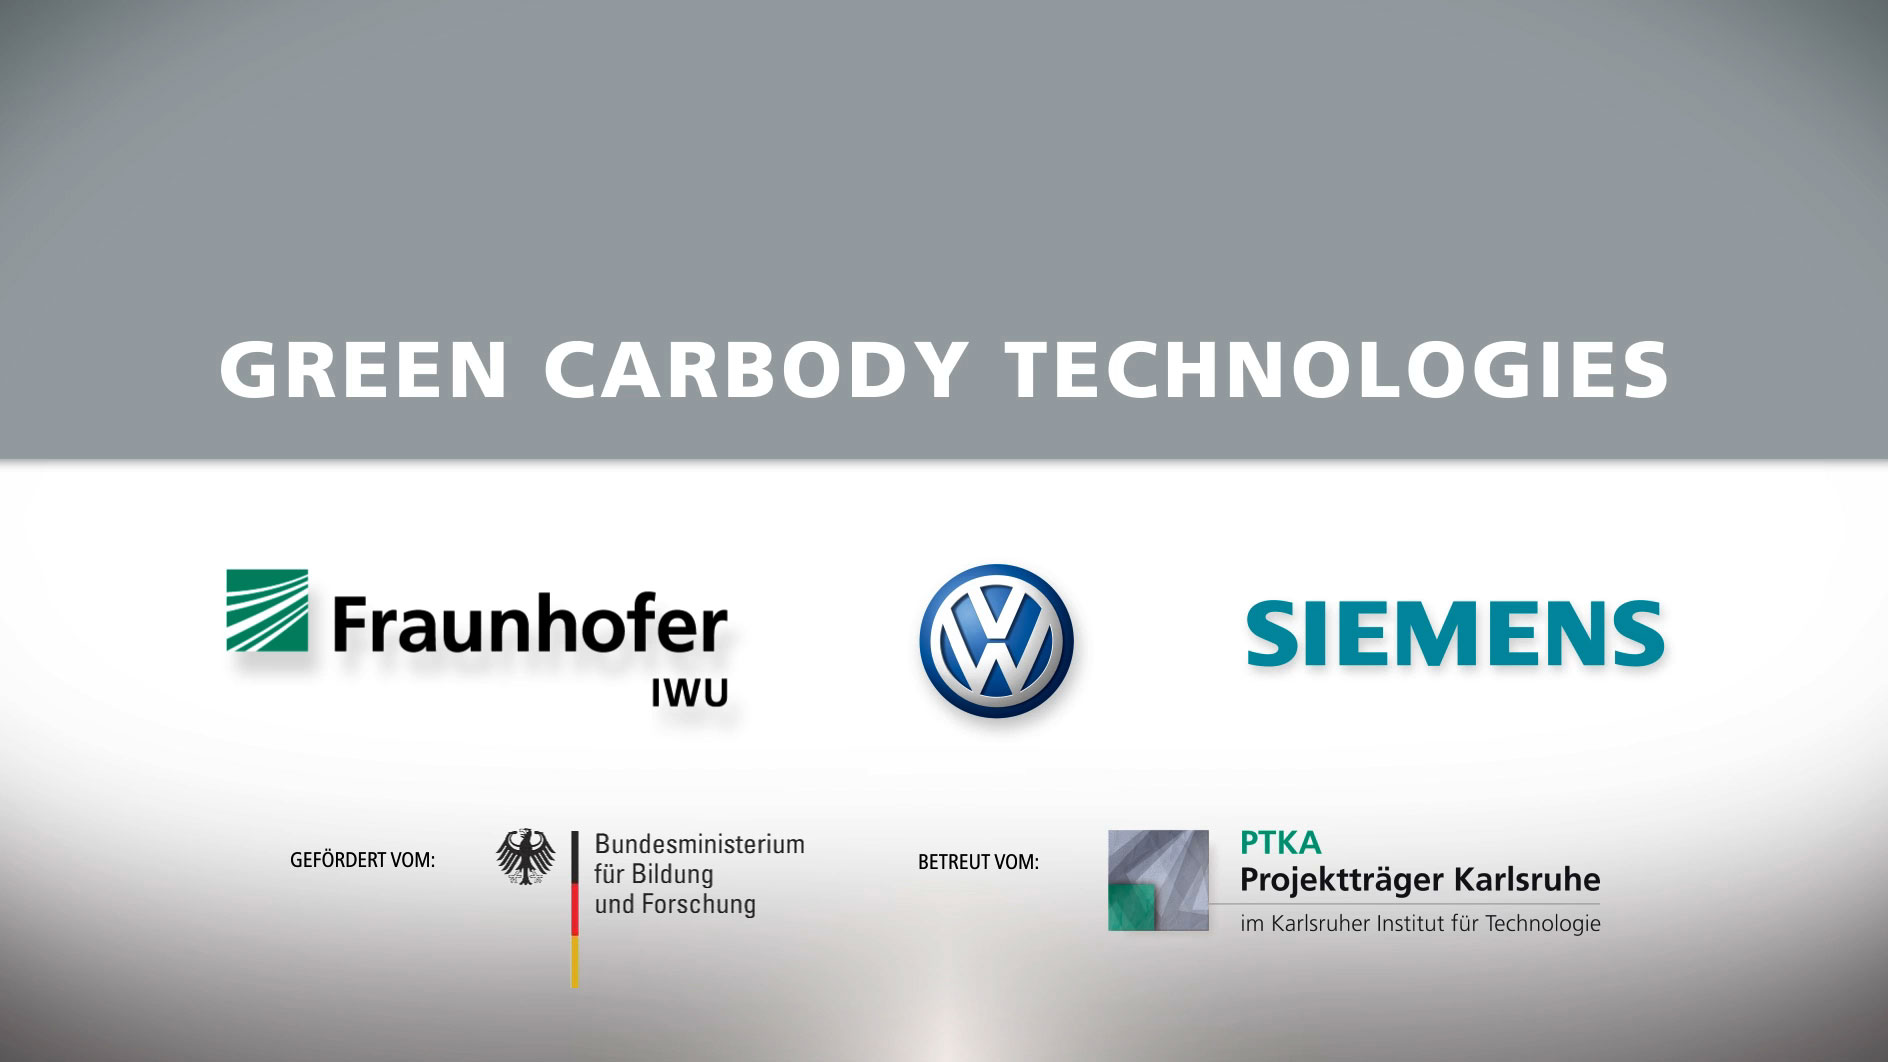 20130419_Siemens_Roboter_005.jpg